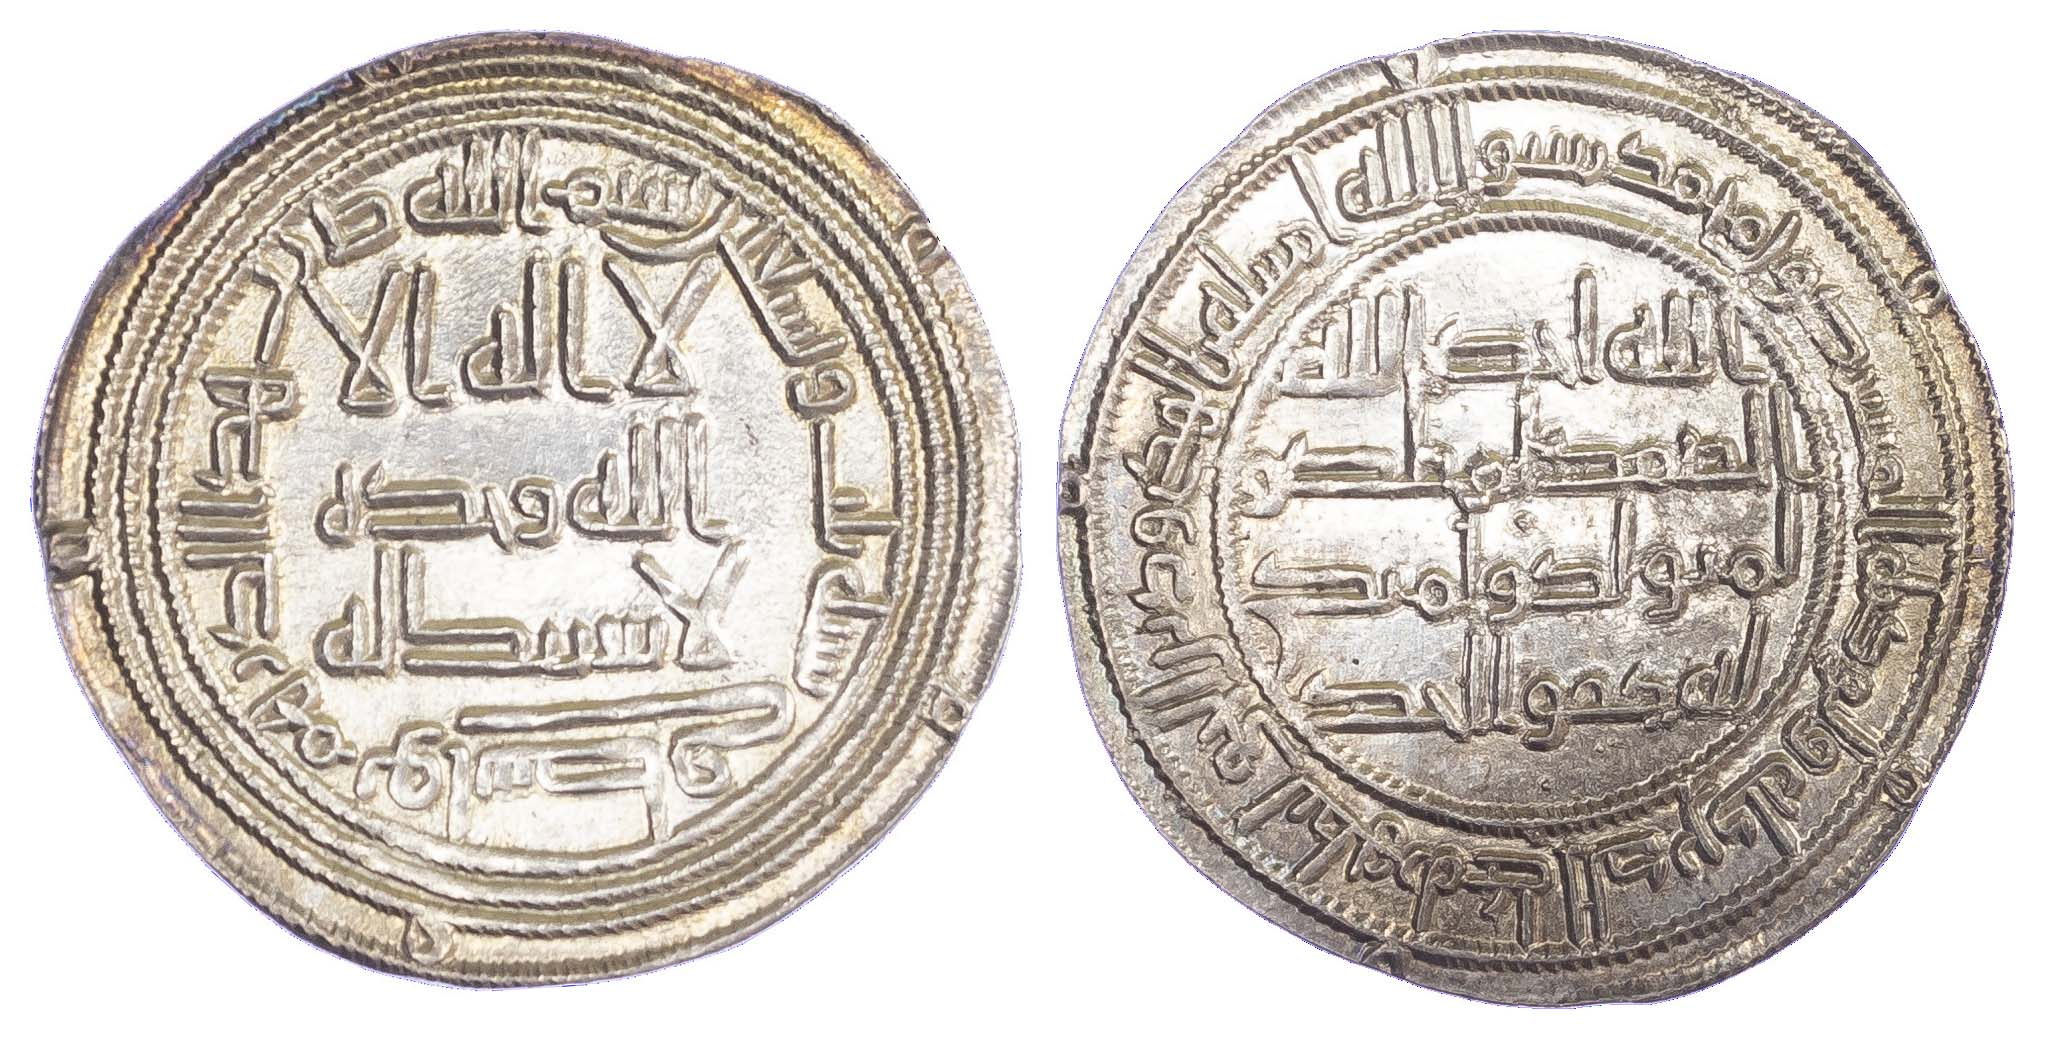 Umayyad, Al-Walid I ibn Abd al-Malik (AH 86-96 / 705-715 AD), silver Dirham